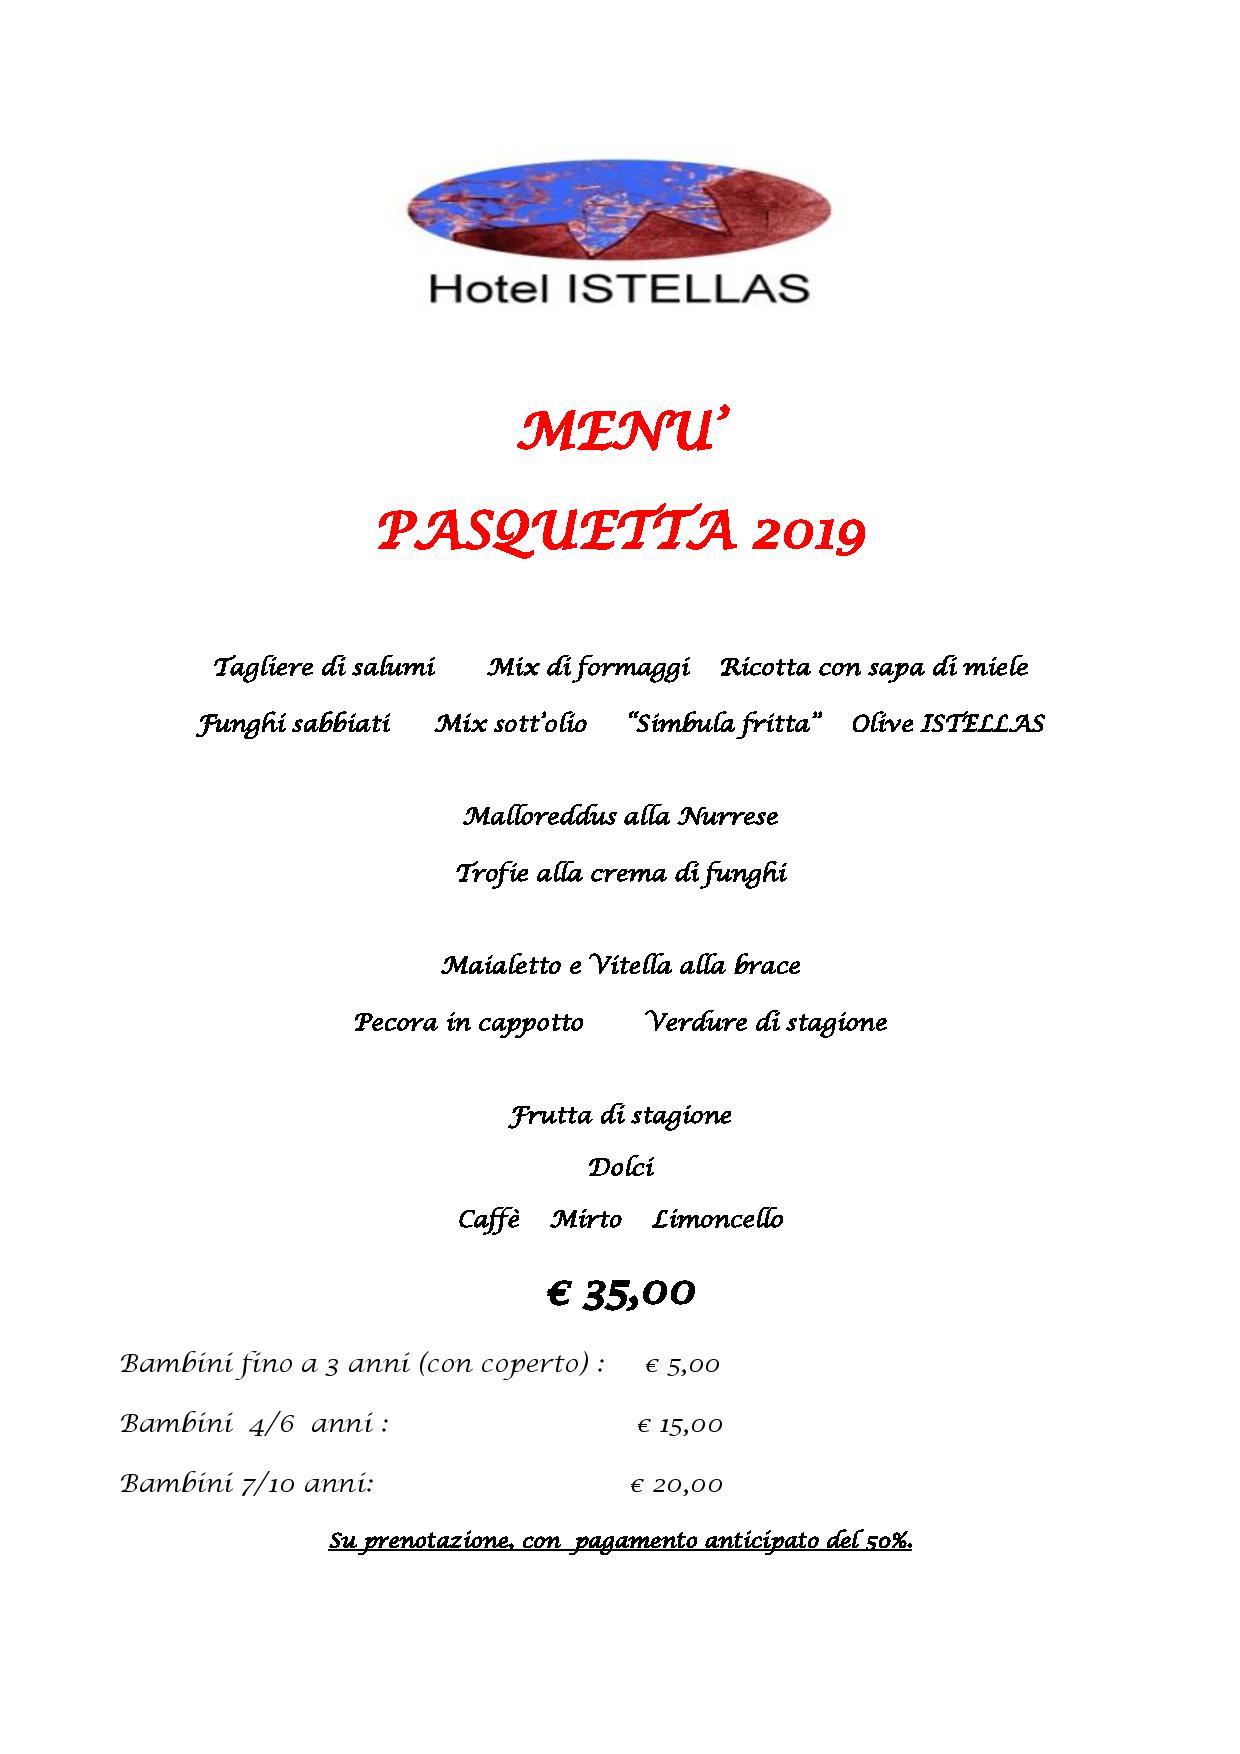 MENU PASQUETTA 2019-page-001